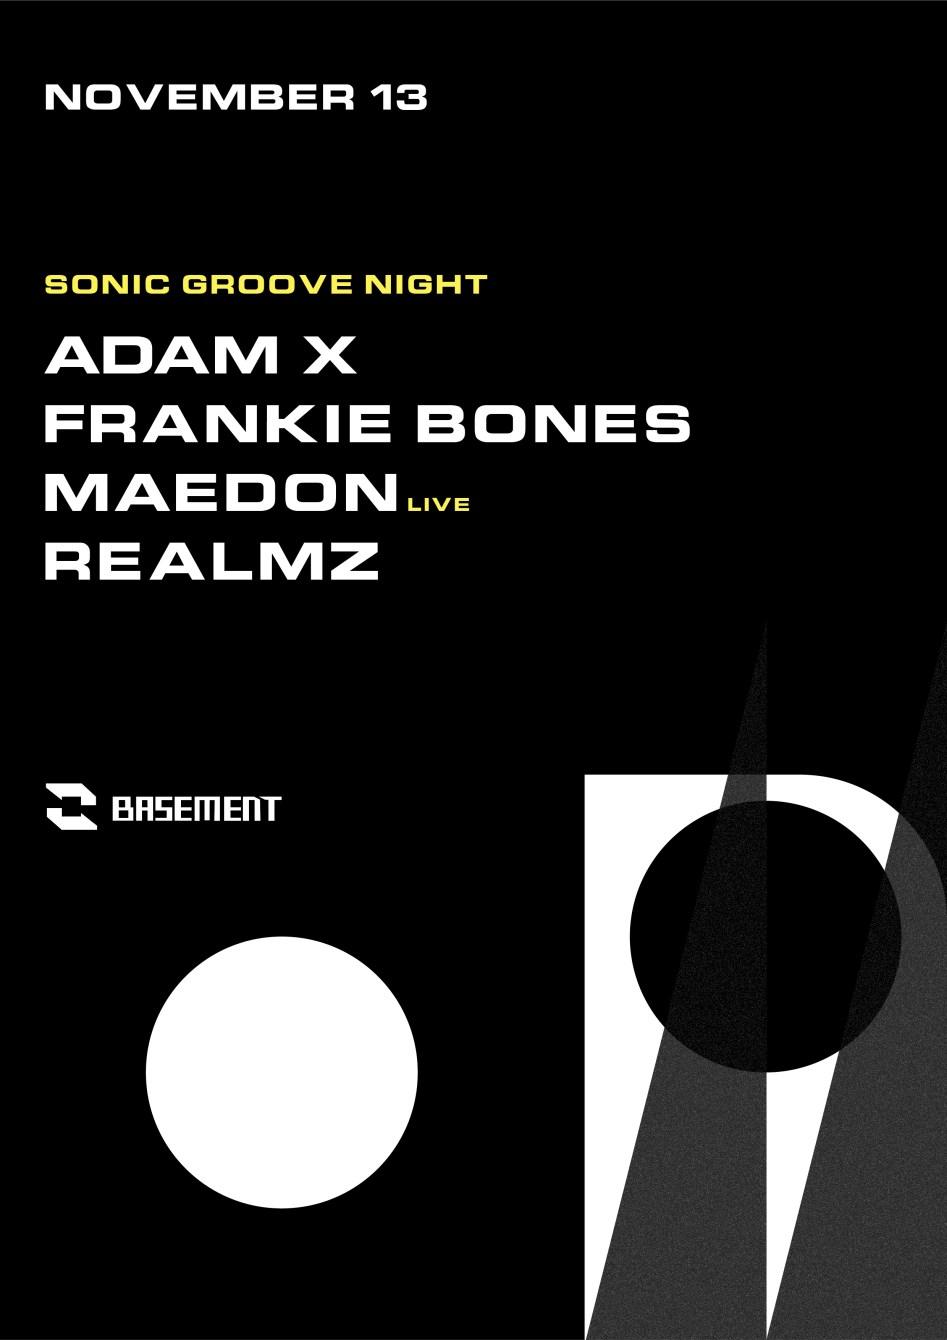 Sonic Groove Night: Adam X / Frankie Bones / MAEDON / Realmz - Flyer front